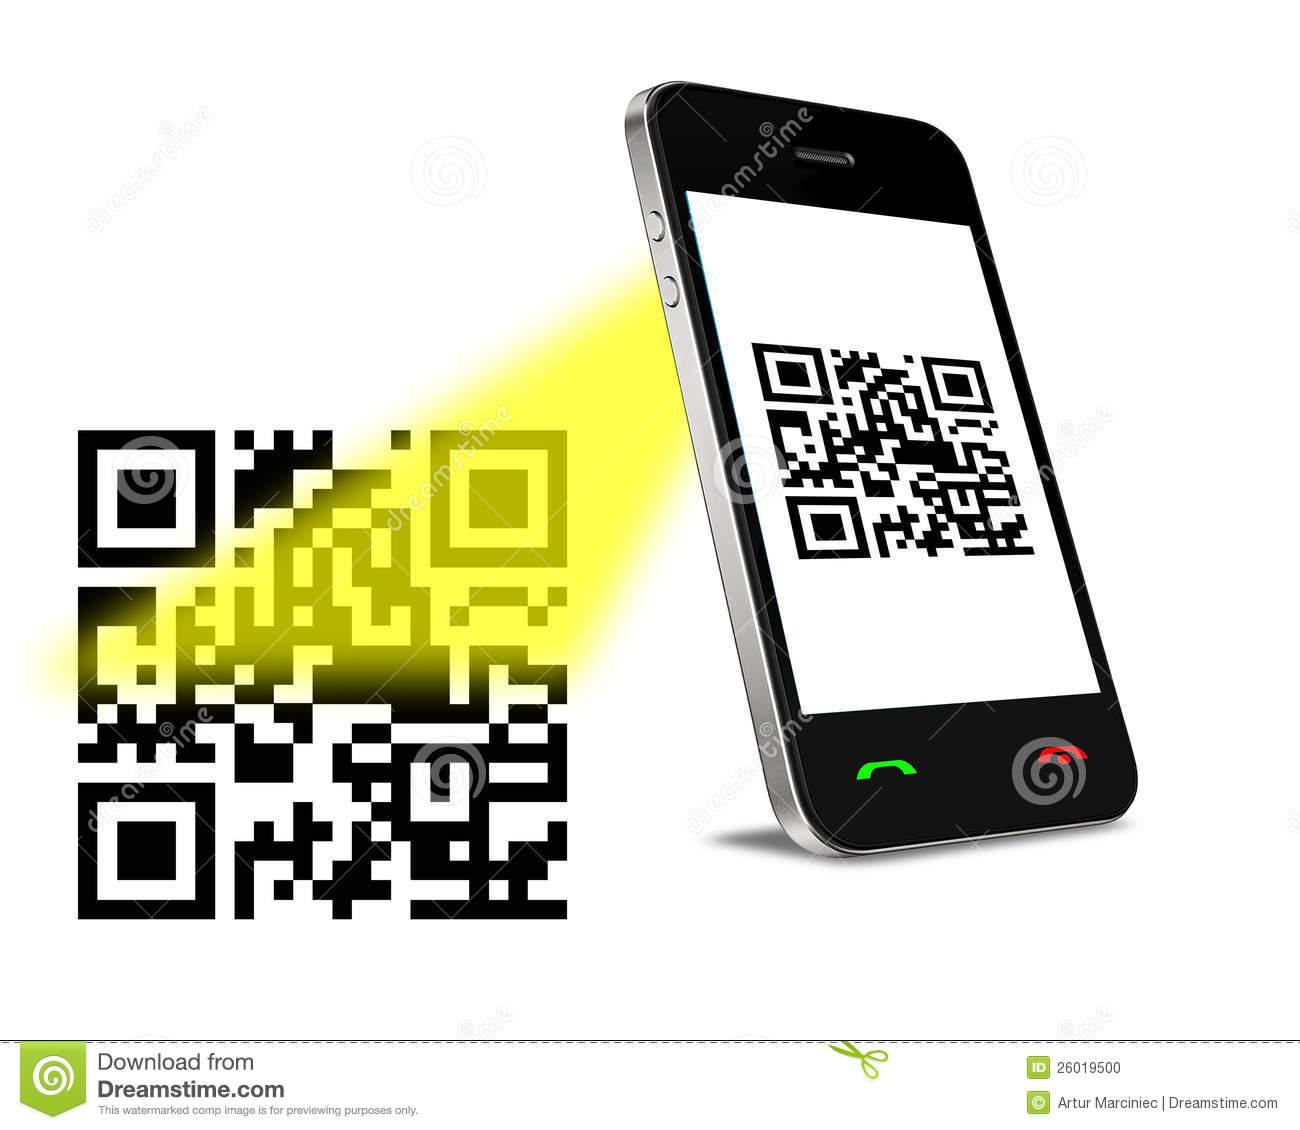 Code clipart qr code Code On Code Qr QR